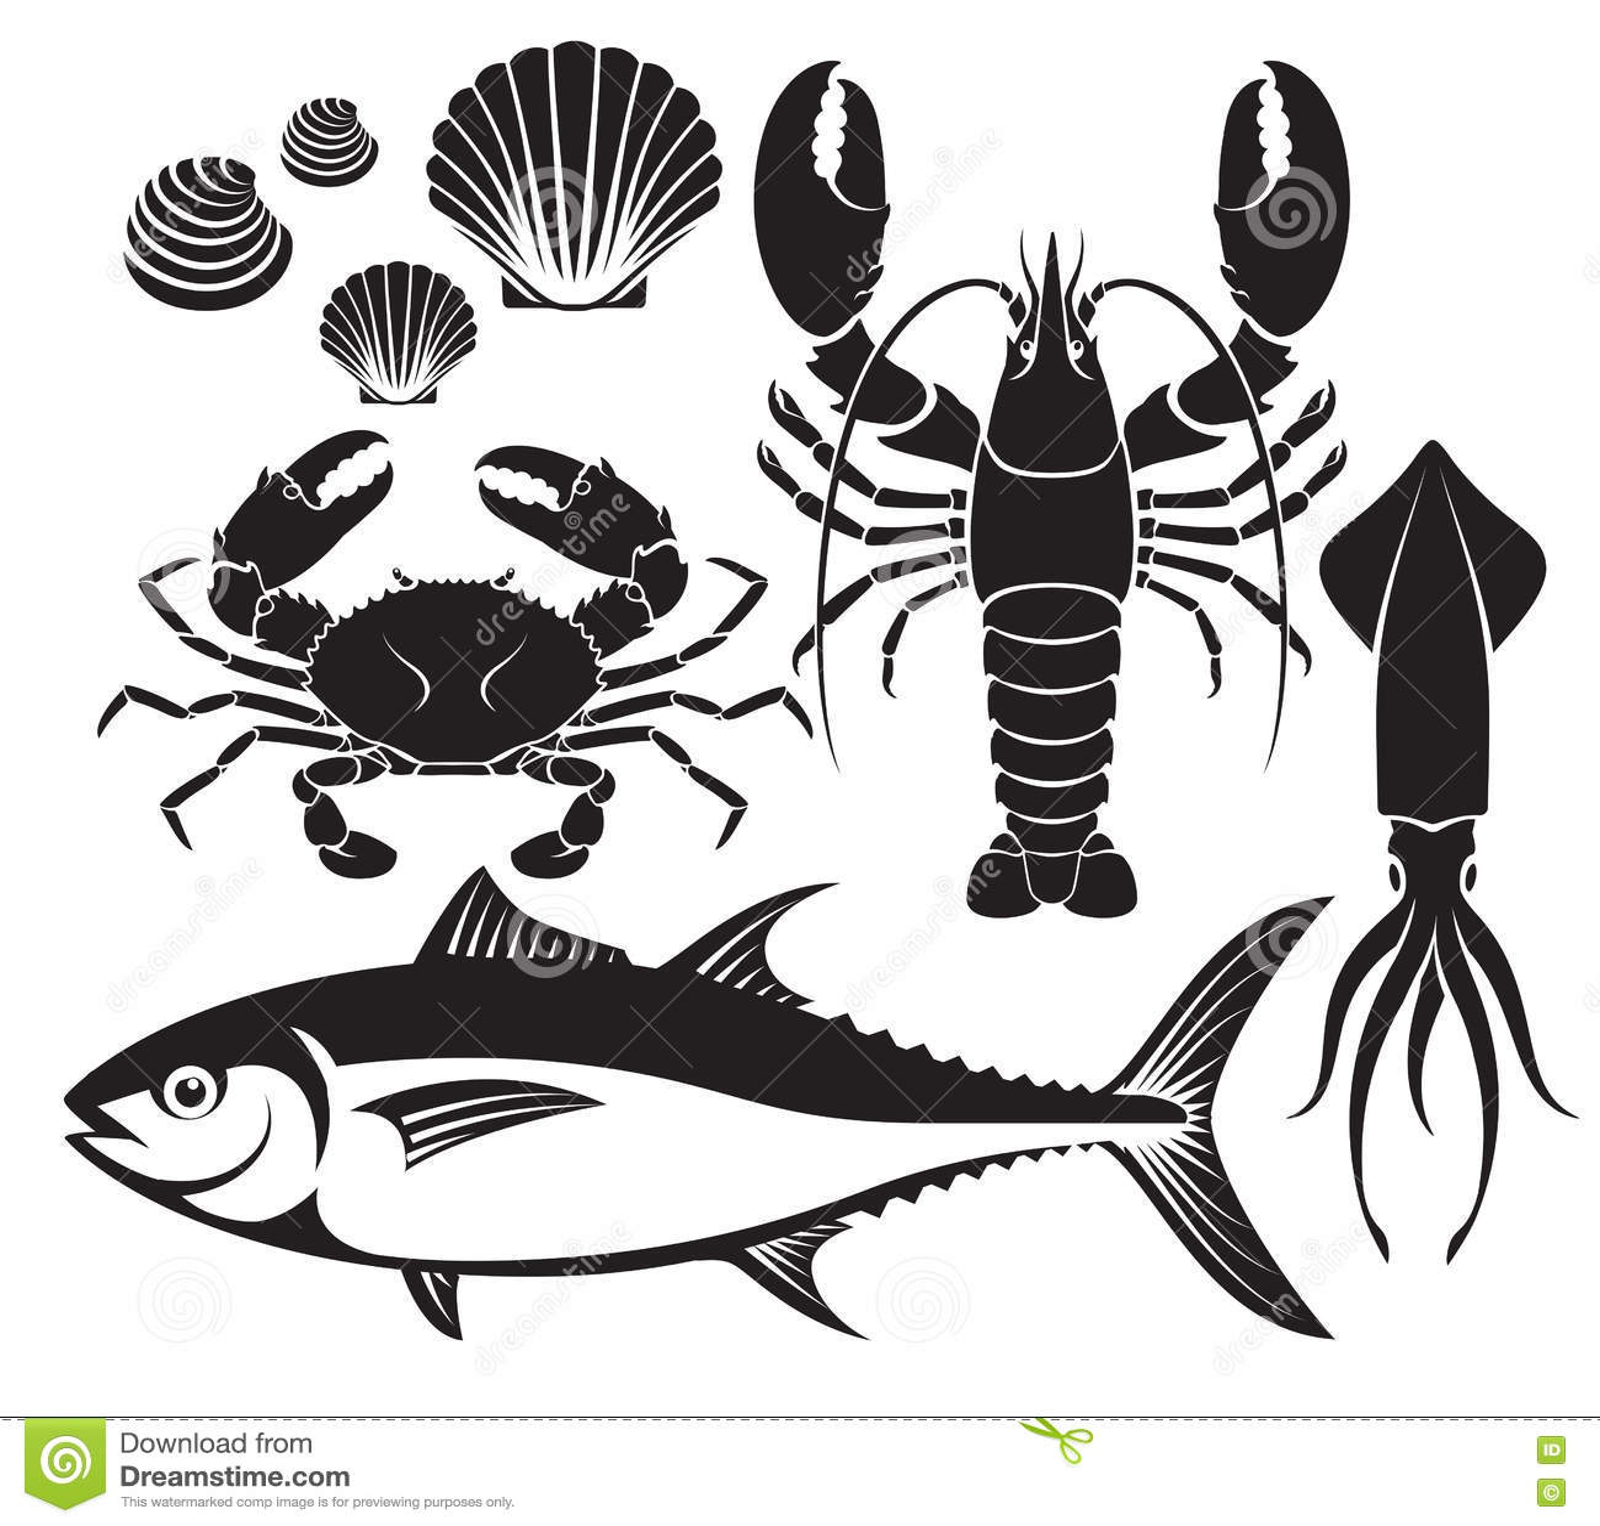 Crab Silhouette Cartoon Vector